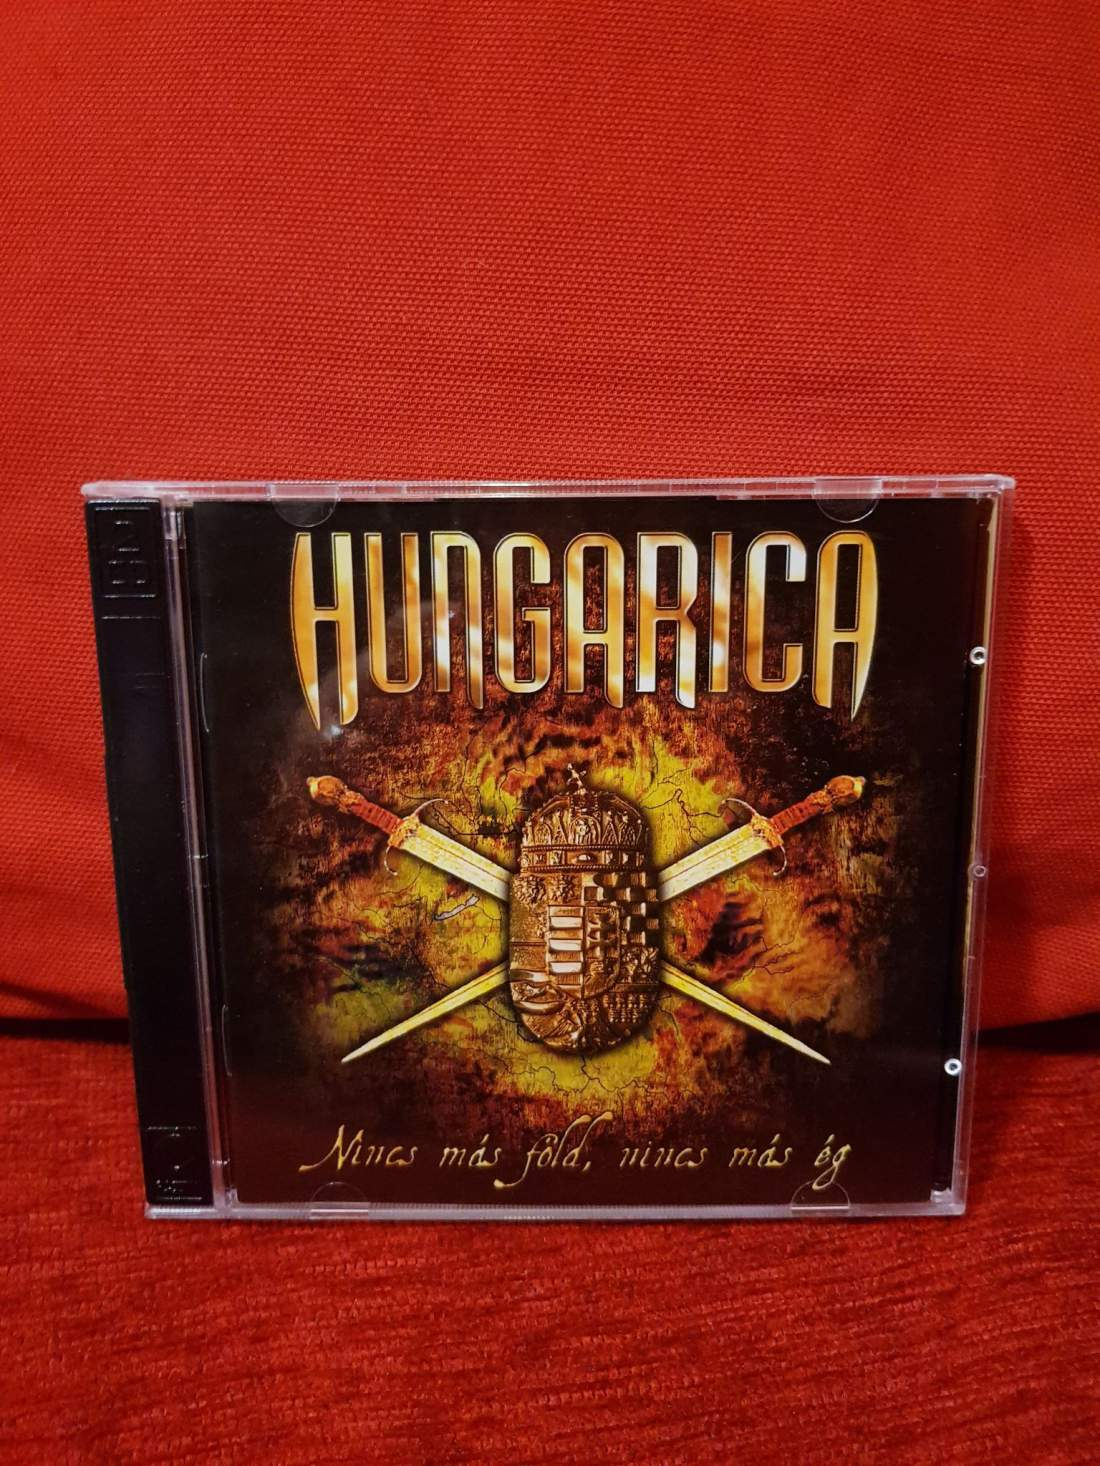 HUNGARICA - NINCS MÁS FÖLD, NINCS MÁS ÉG CD+DVD